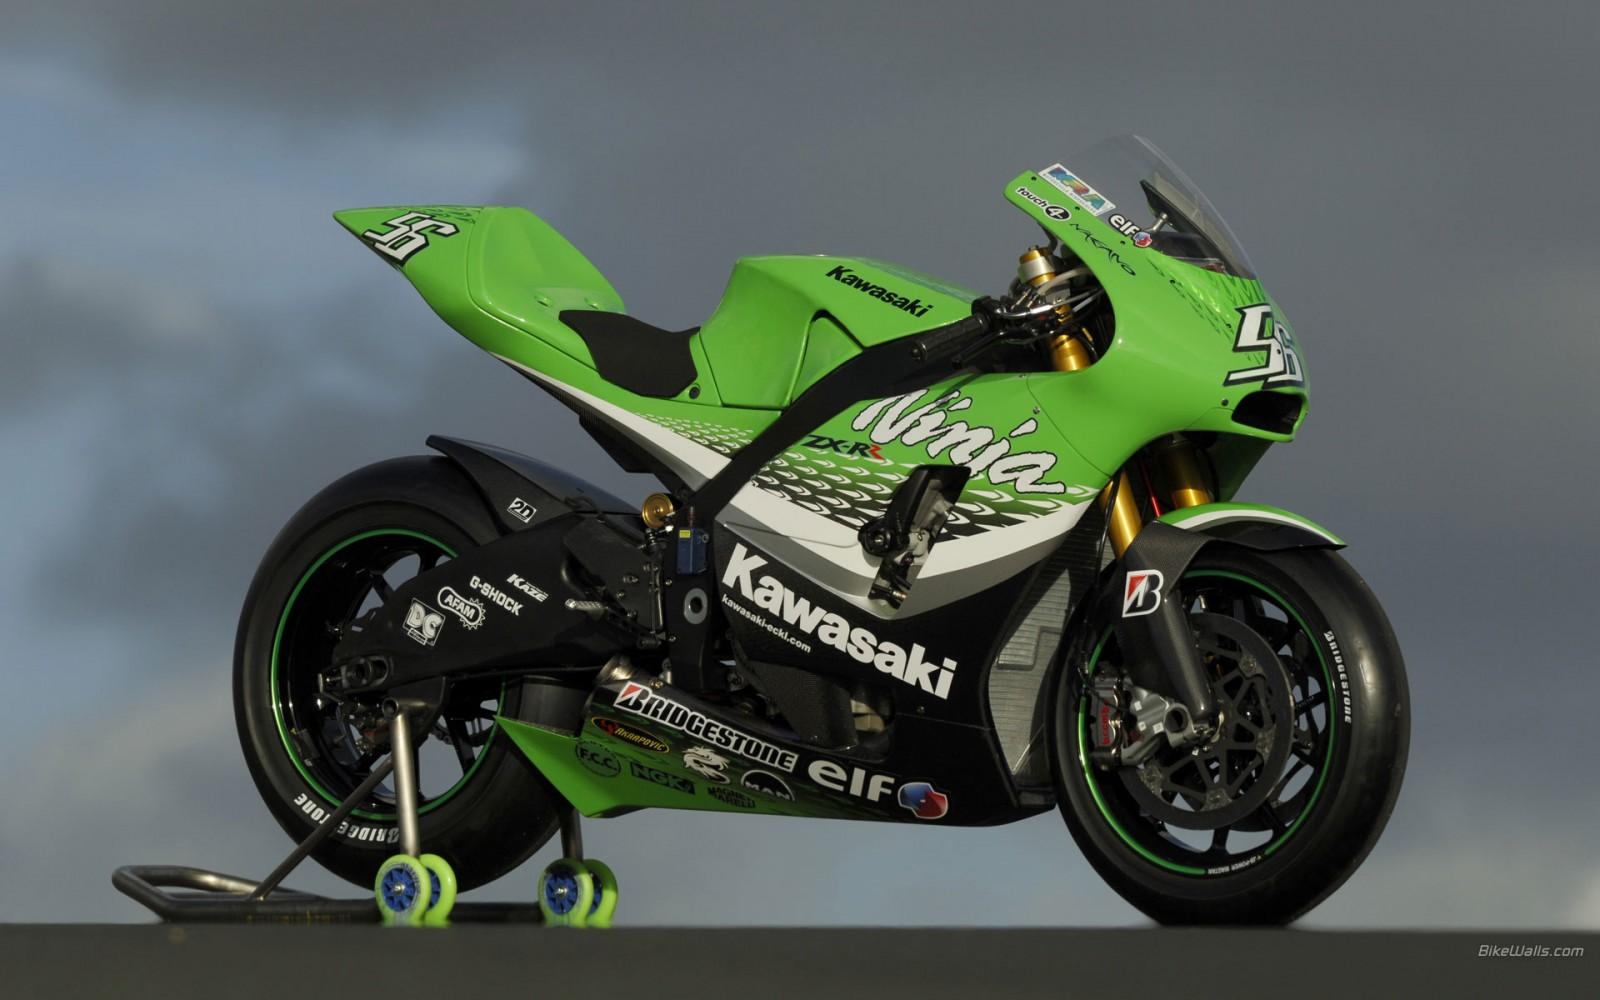 Kawasaki Ninja Rr Dane Techniczne